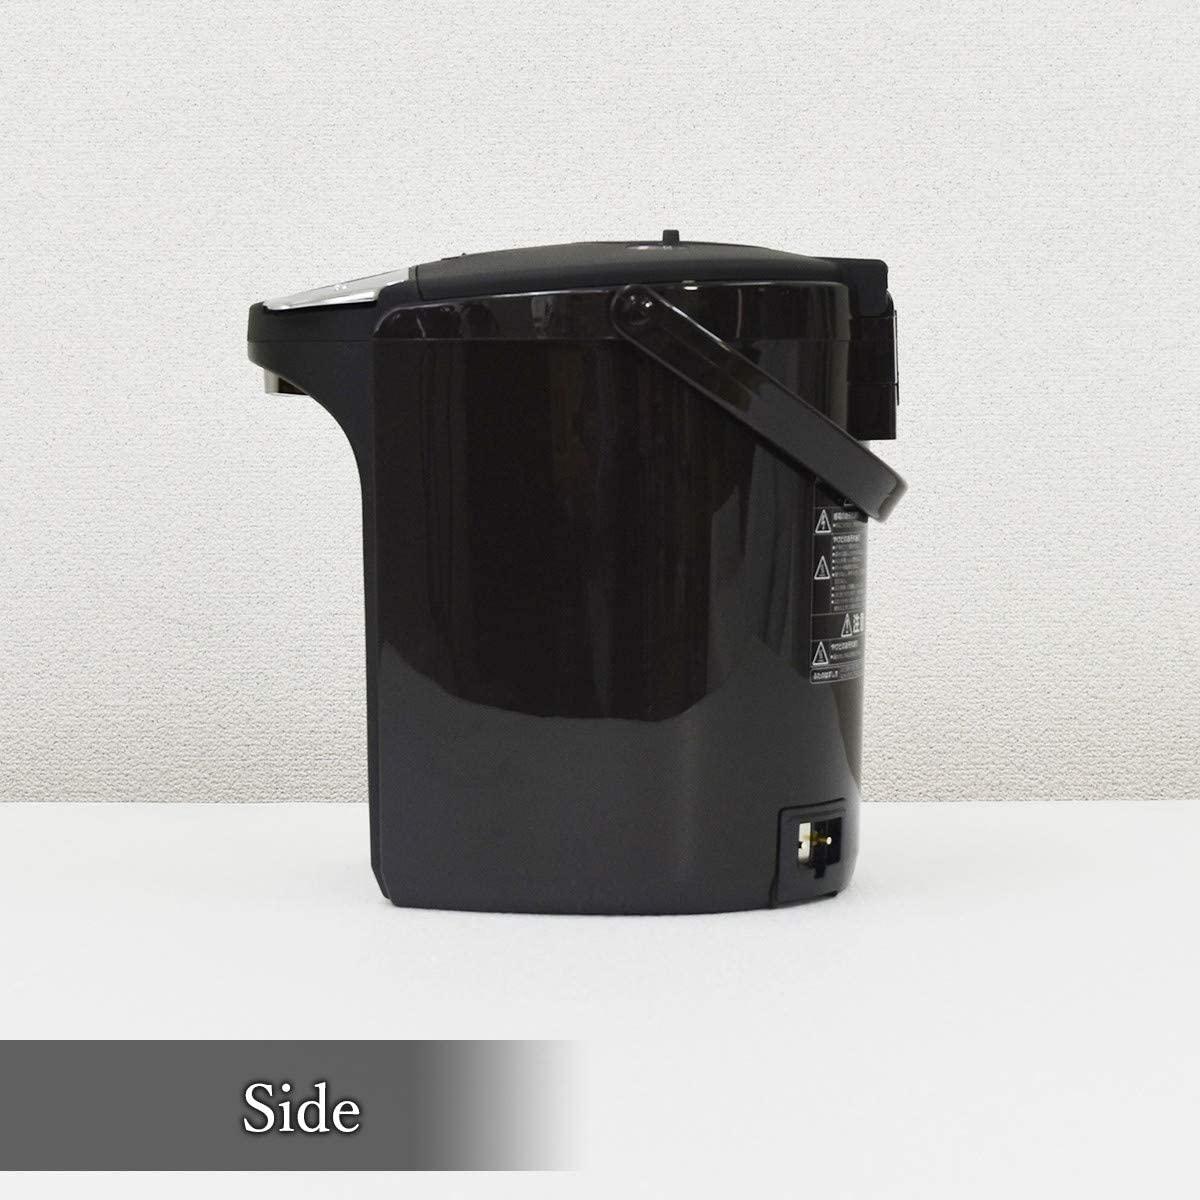 TIGER(タイガー)蒸気レスVE電気まほうびん PIS-A220の商品画像11